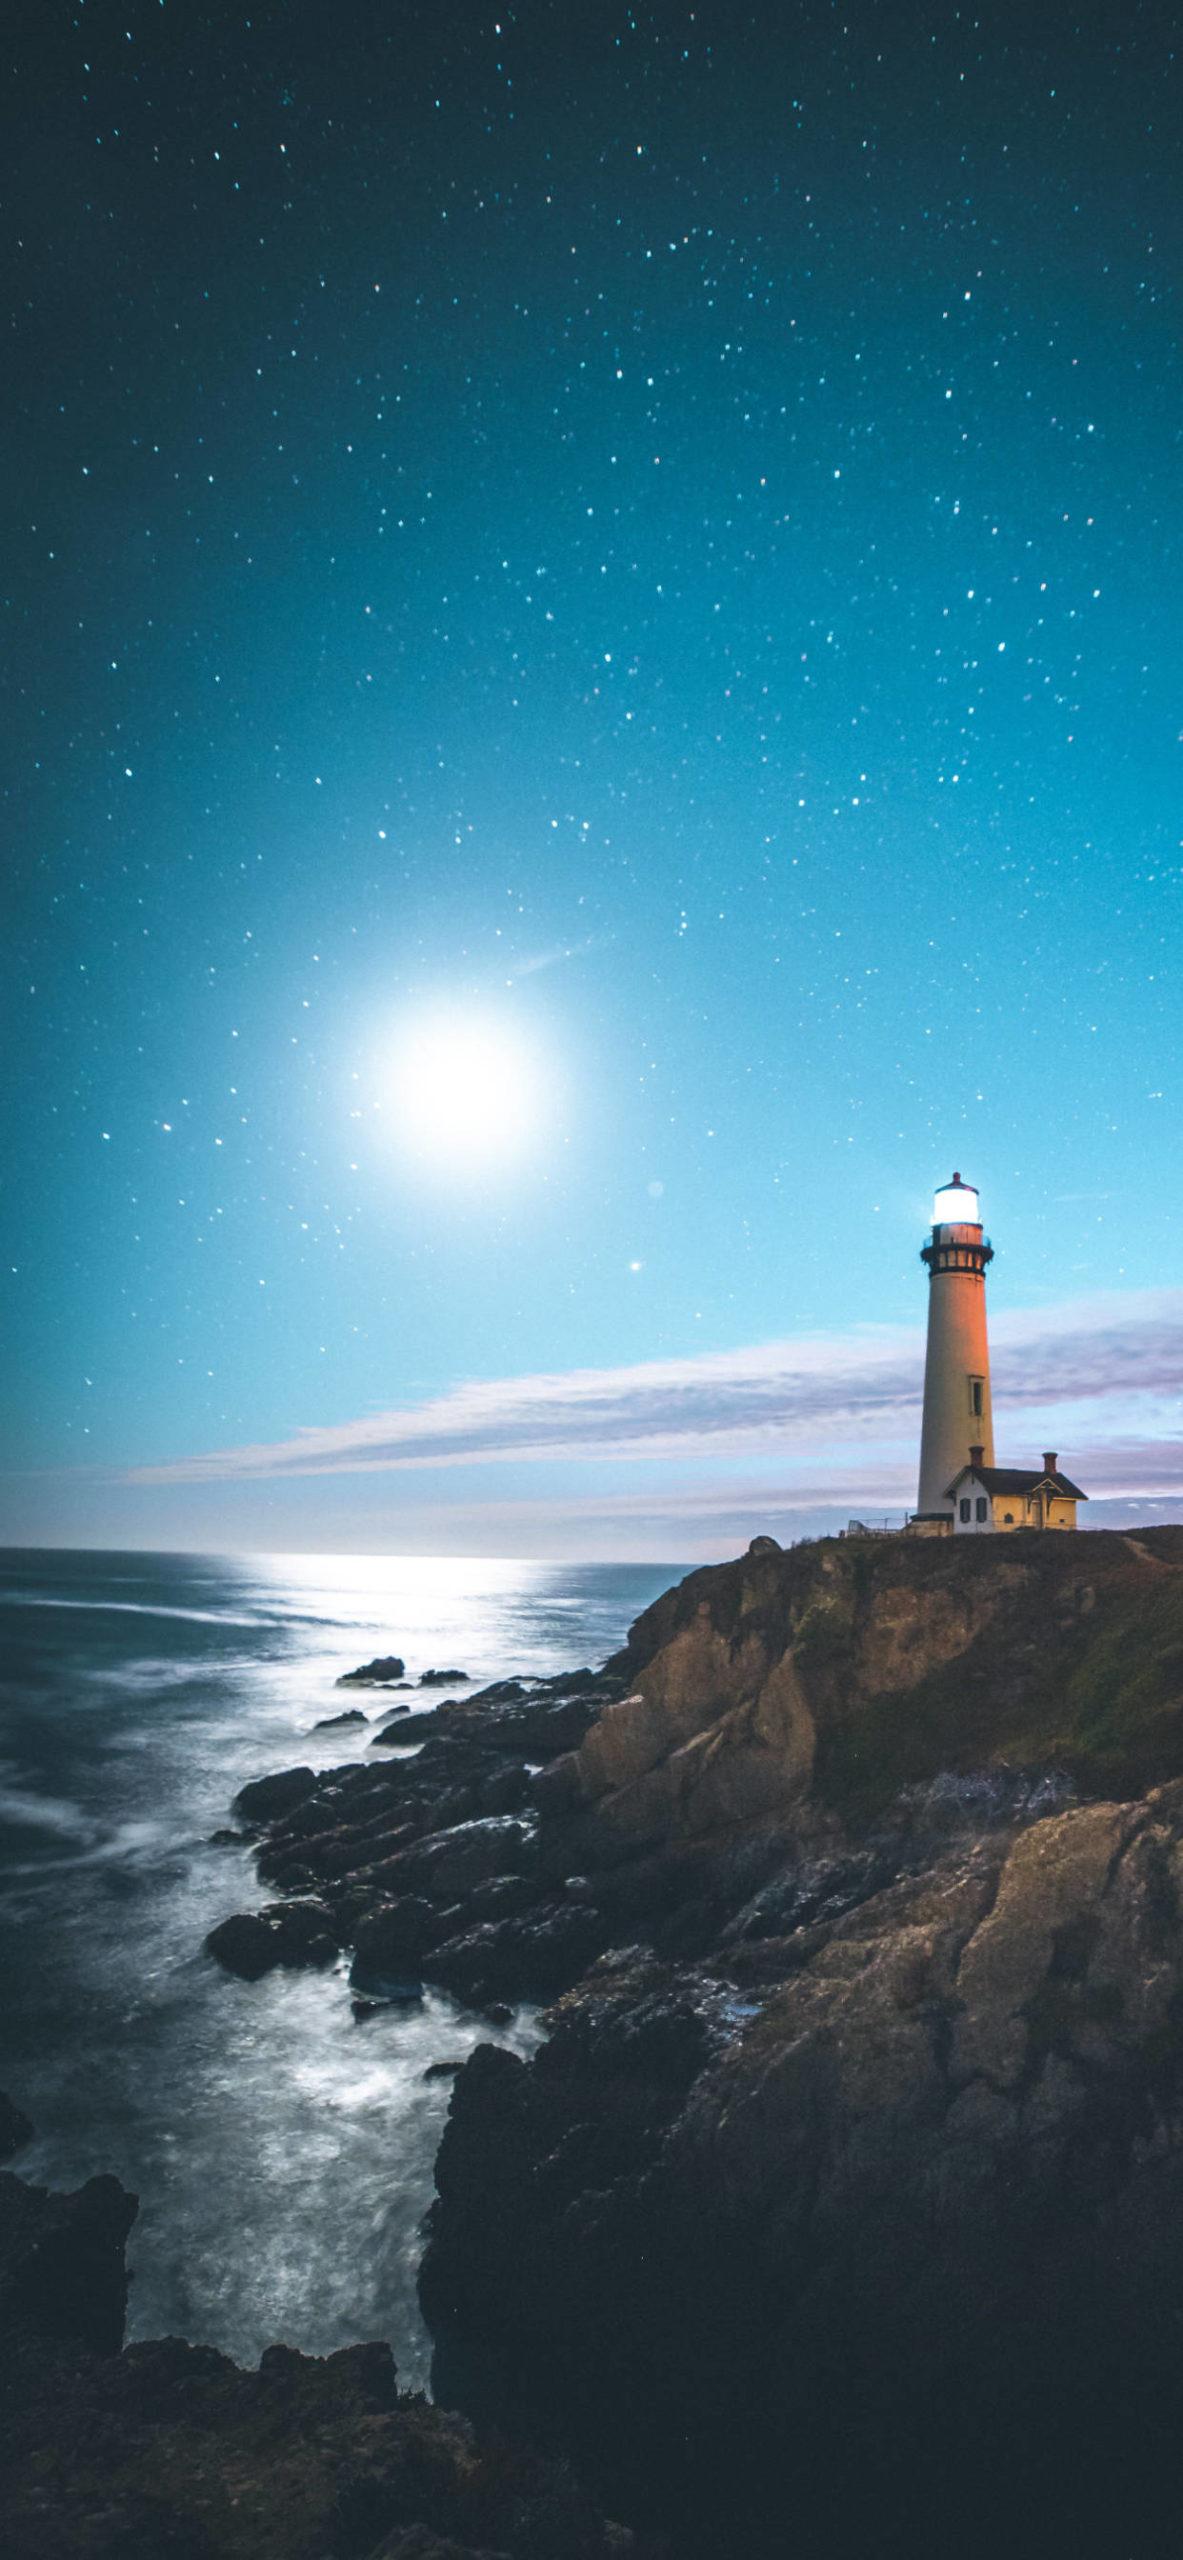 iPhone wallpapers lighthouse pescadero united states scaled Lighthouse